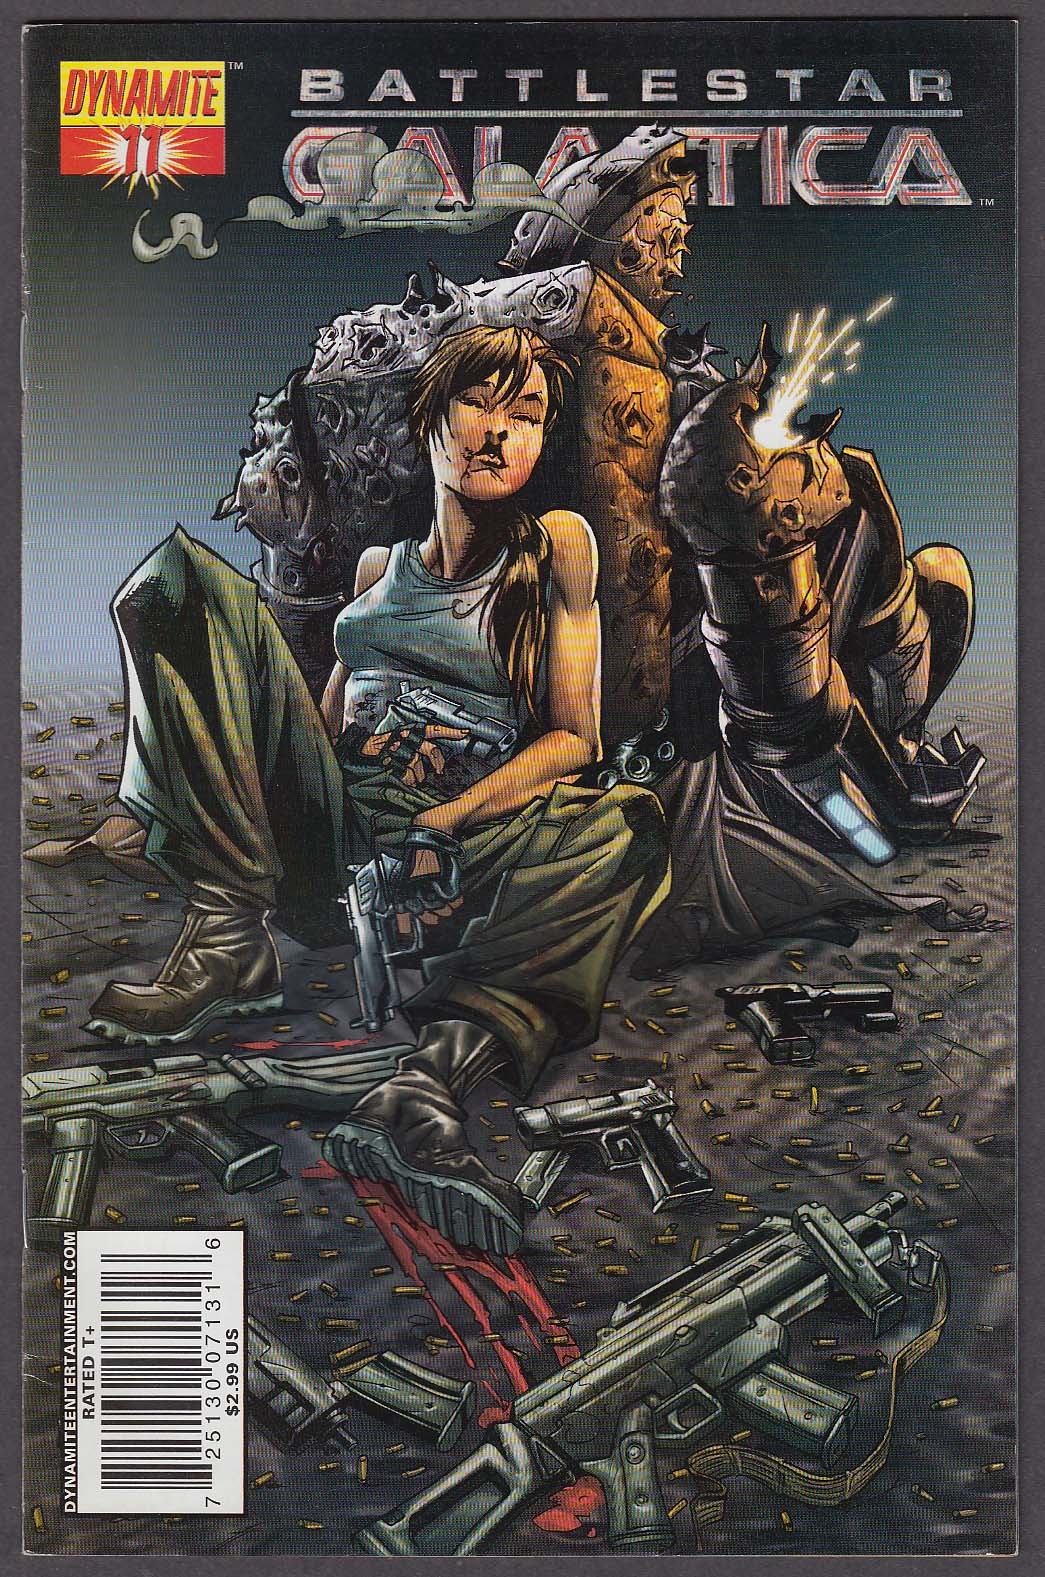 BATTLESTAR GALACTICA #11 Dynamite comic book 2007 1st Printing